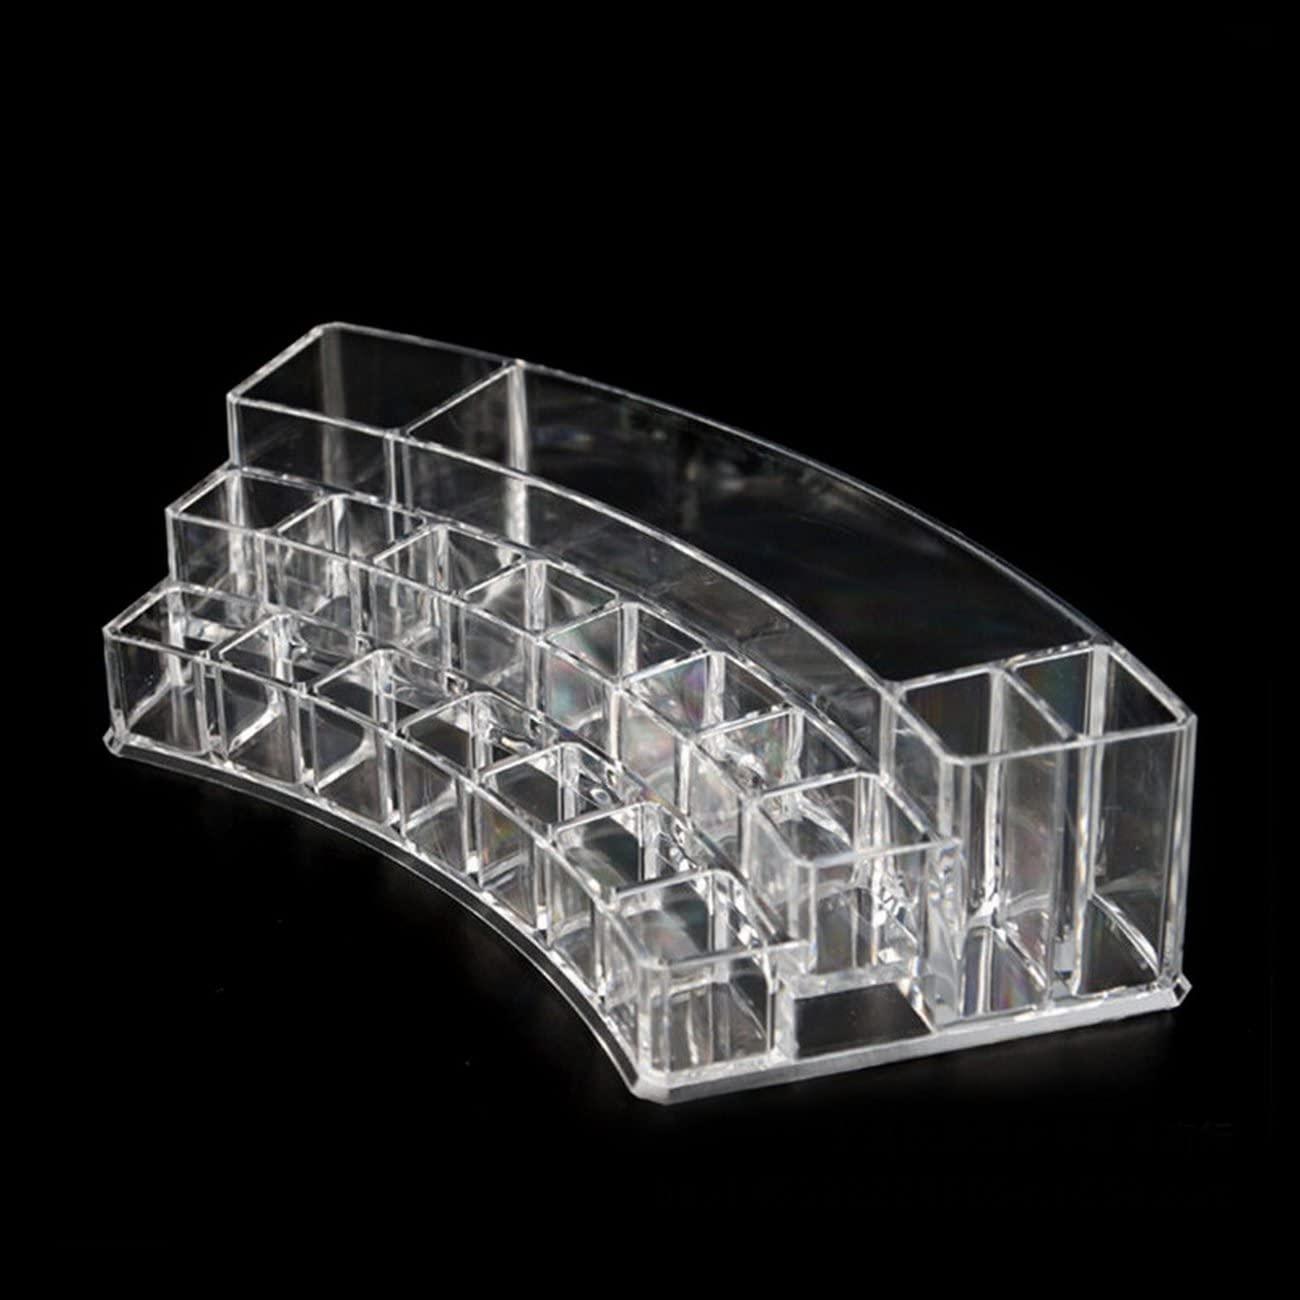 KUAILEJIA jewelry storage box acrylic cosmetic jewelry storage box cosmetic box storage bo